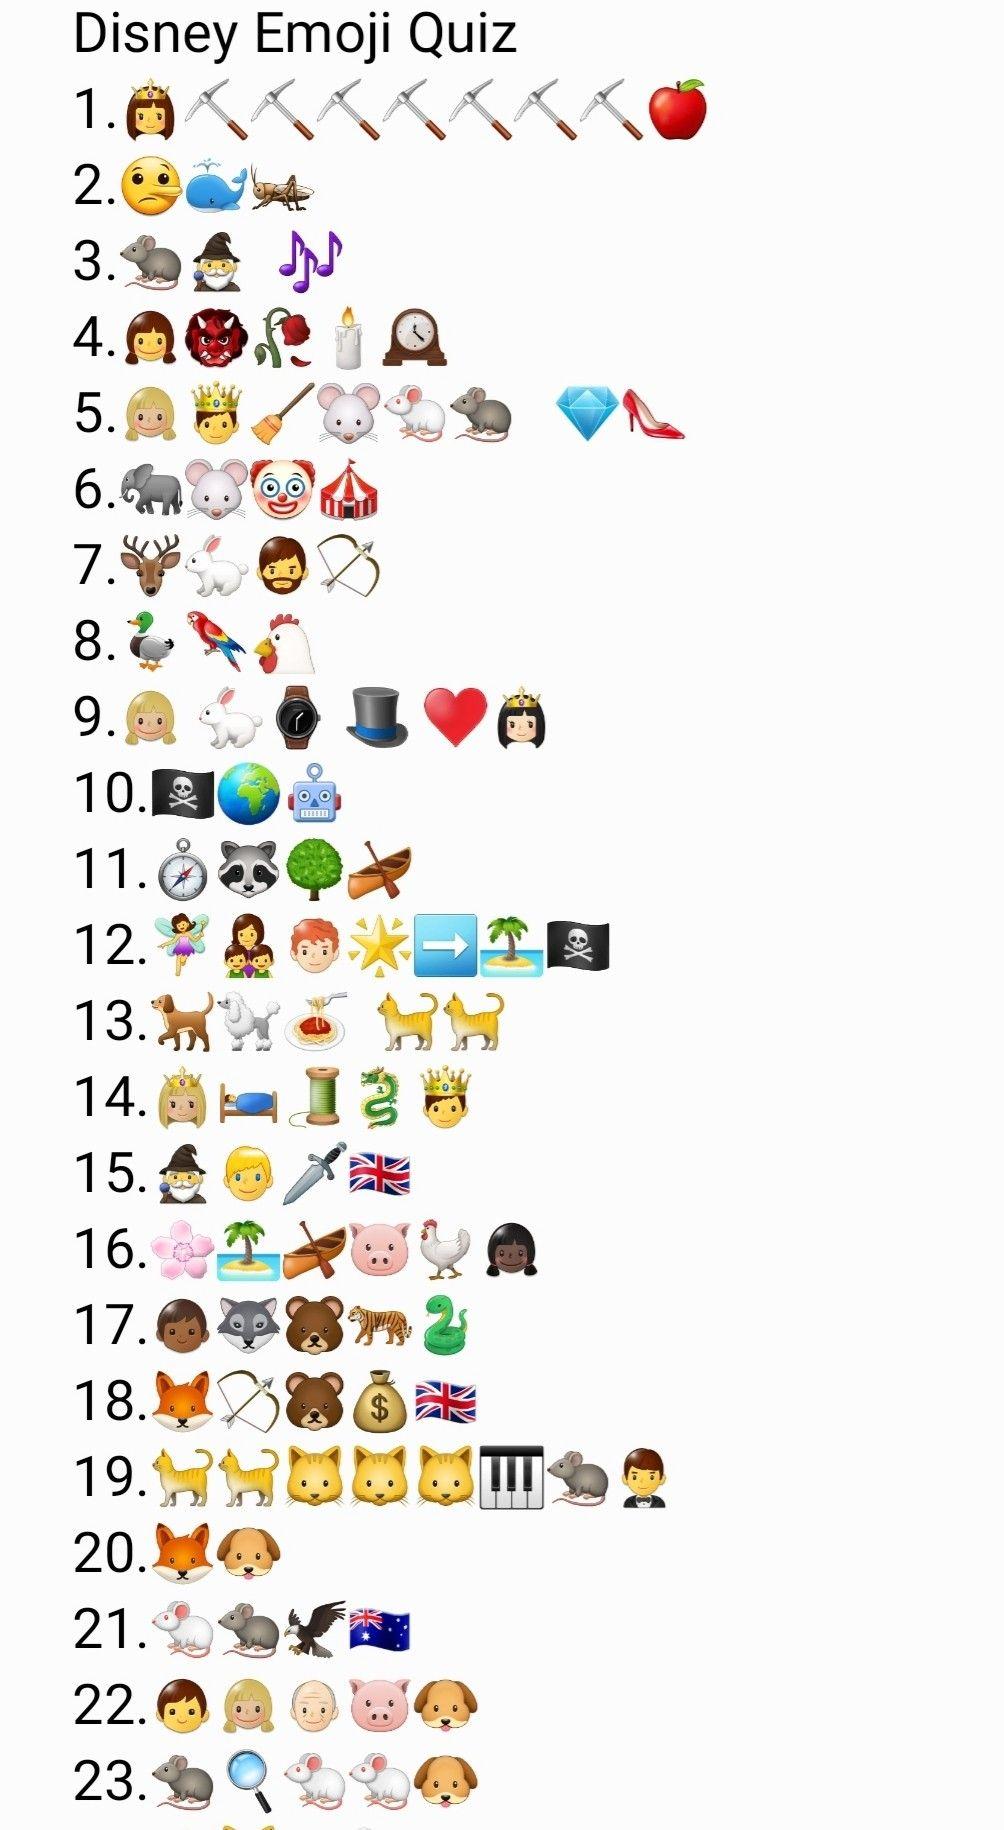 Disney Emoji Quiz Part 1 In 2020 Emoji Quiz Disney Emoji Emoji Games